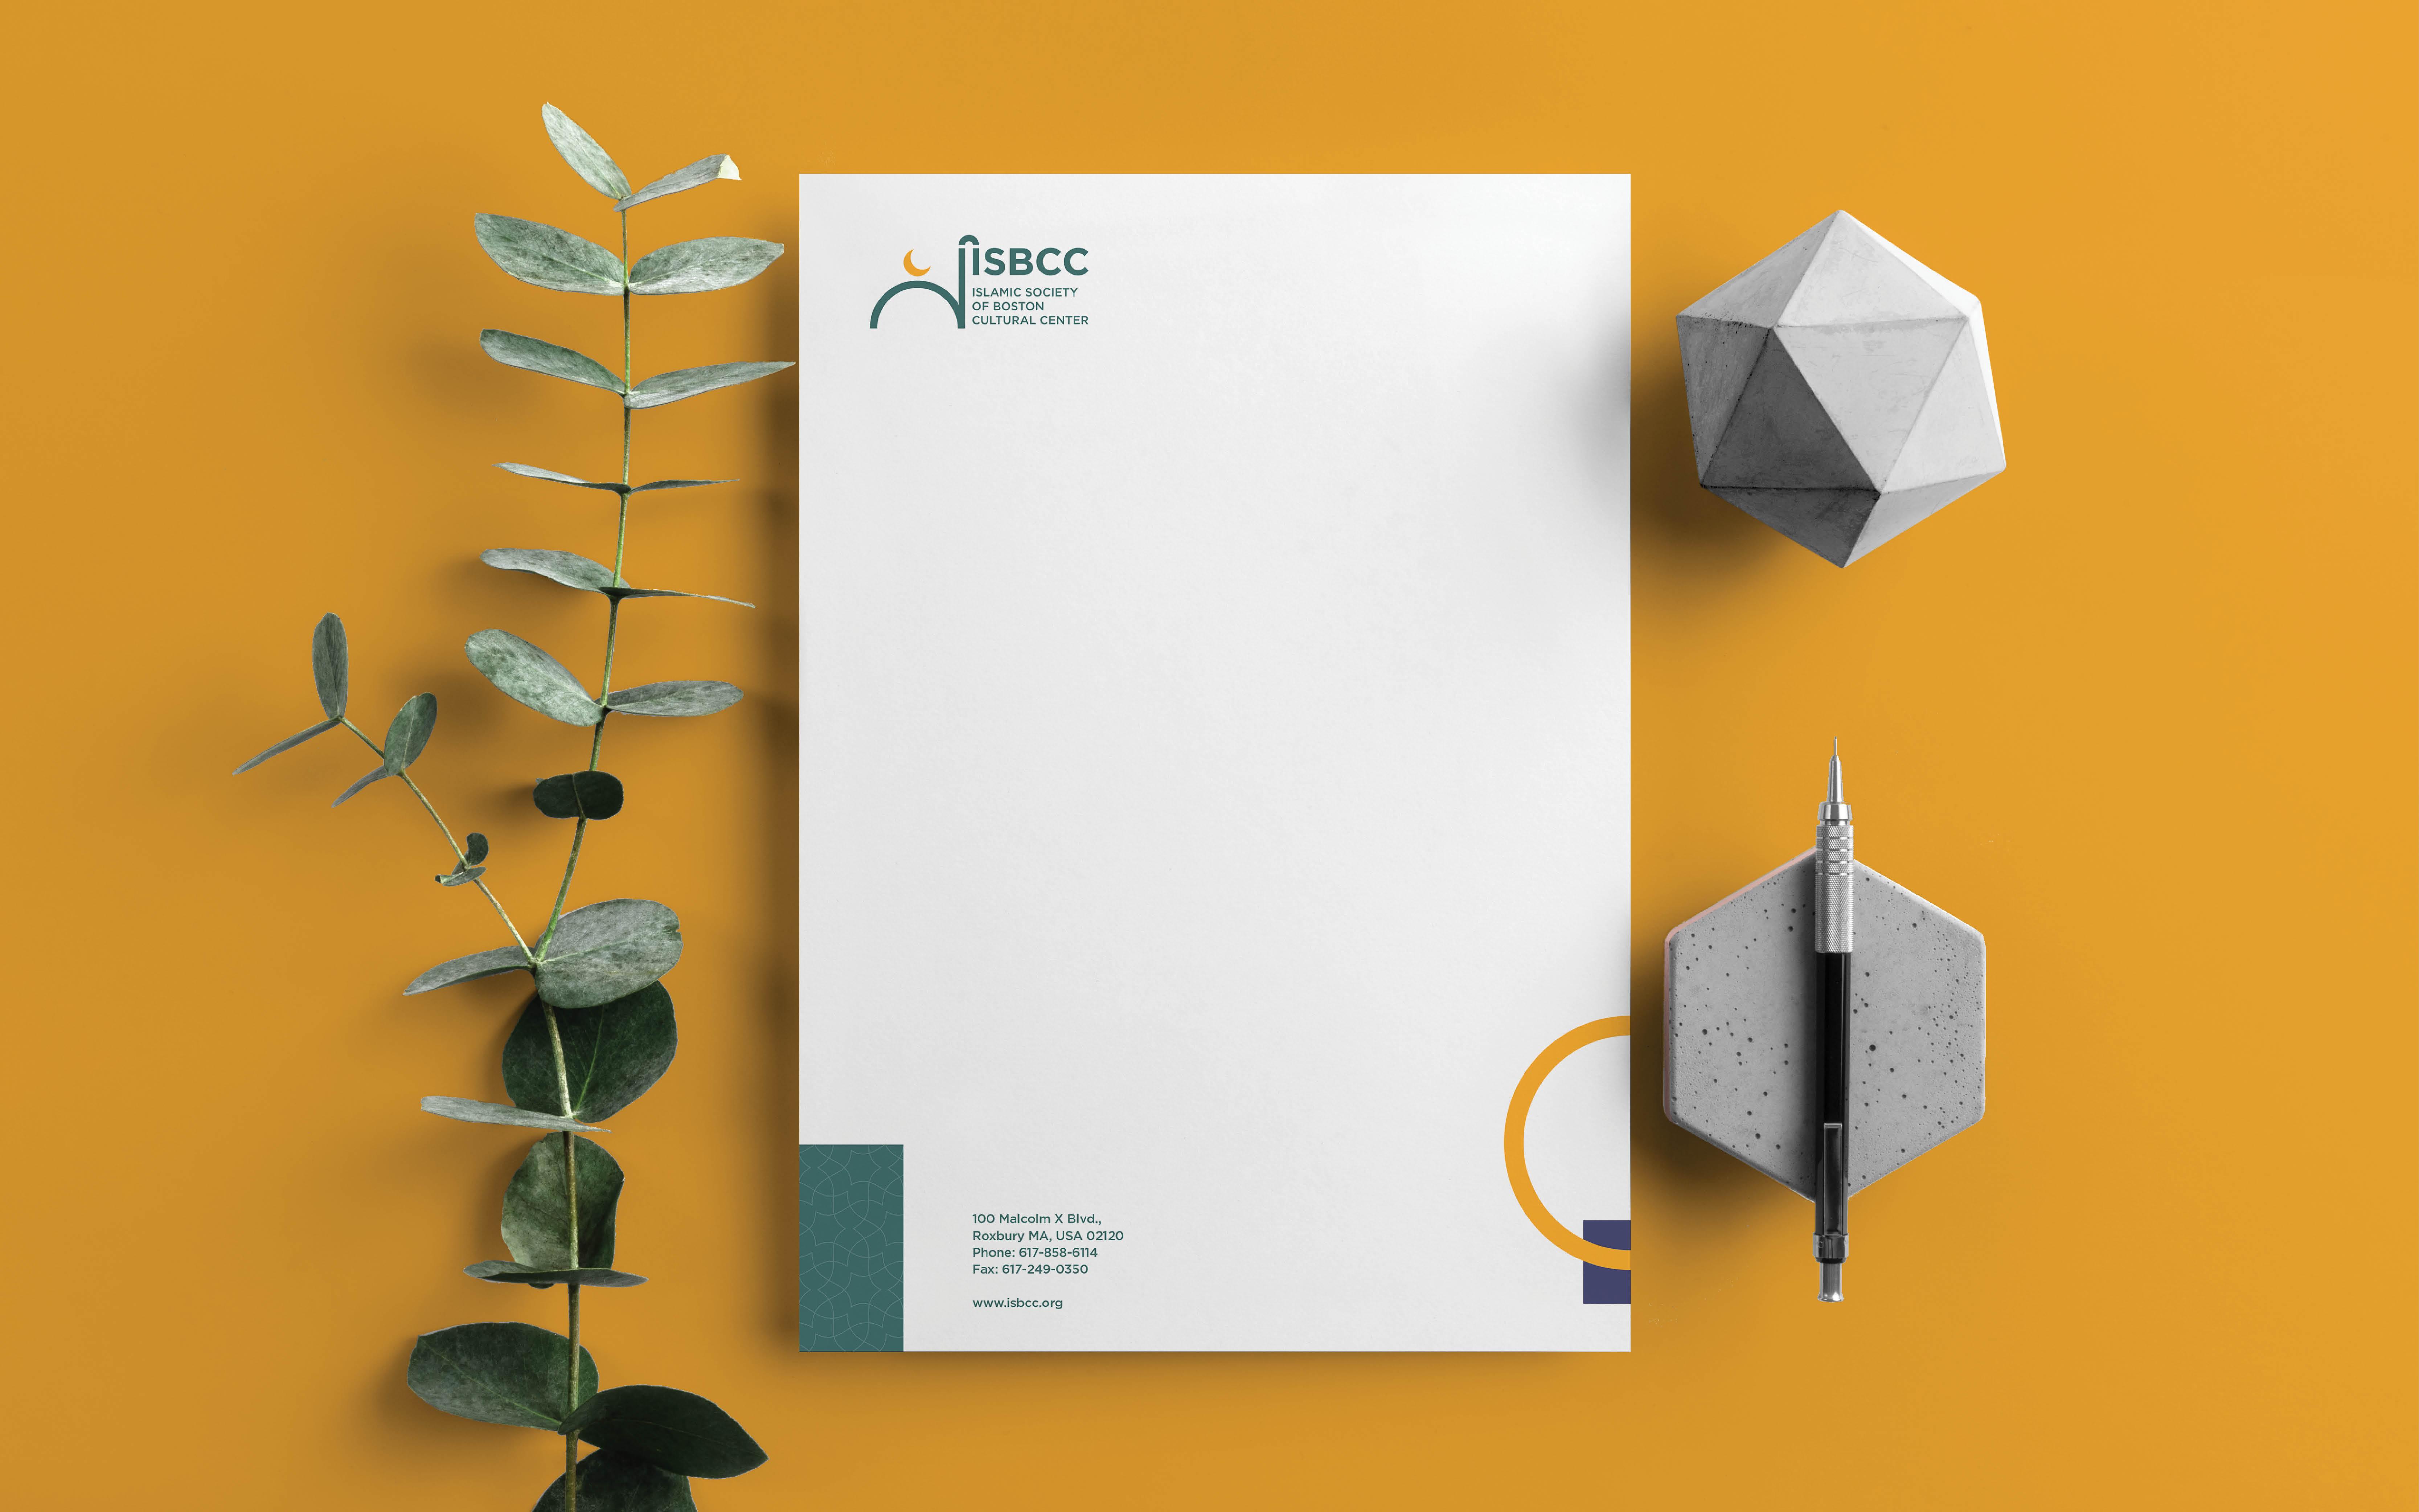 ISBCC_Branding6